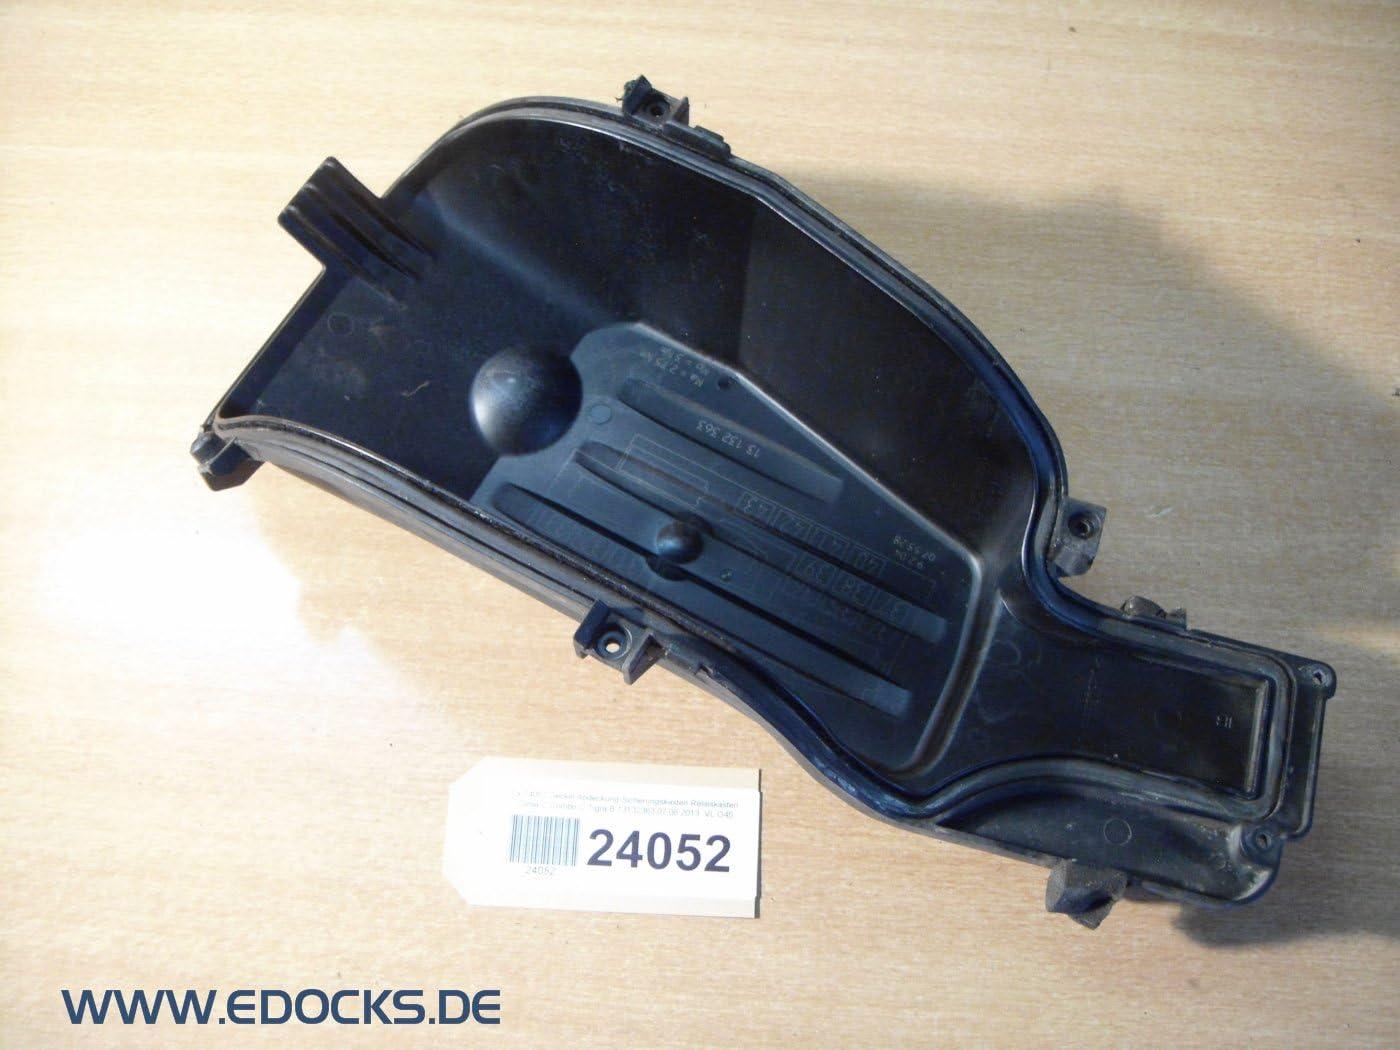 [DHAV_9290]  Fuse Box with Lid Cover Relaiskasten C Combo / Corsa C (Opel) Tigra B:  Amazon.co.uk: Car & Motorbike   Opel Tigra Fuse Box      Amazon.co.uk